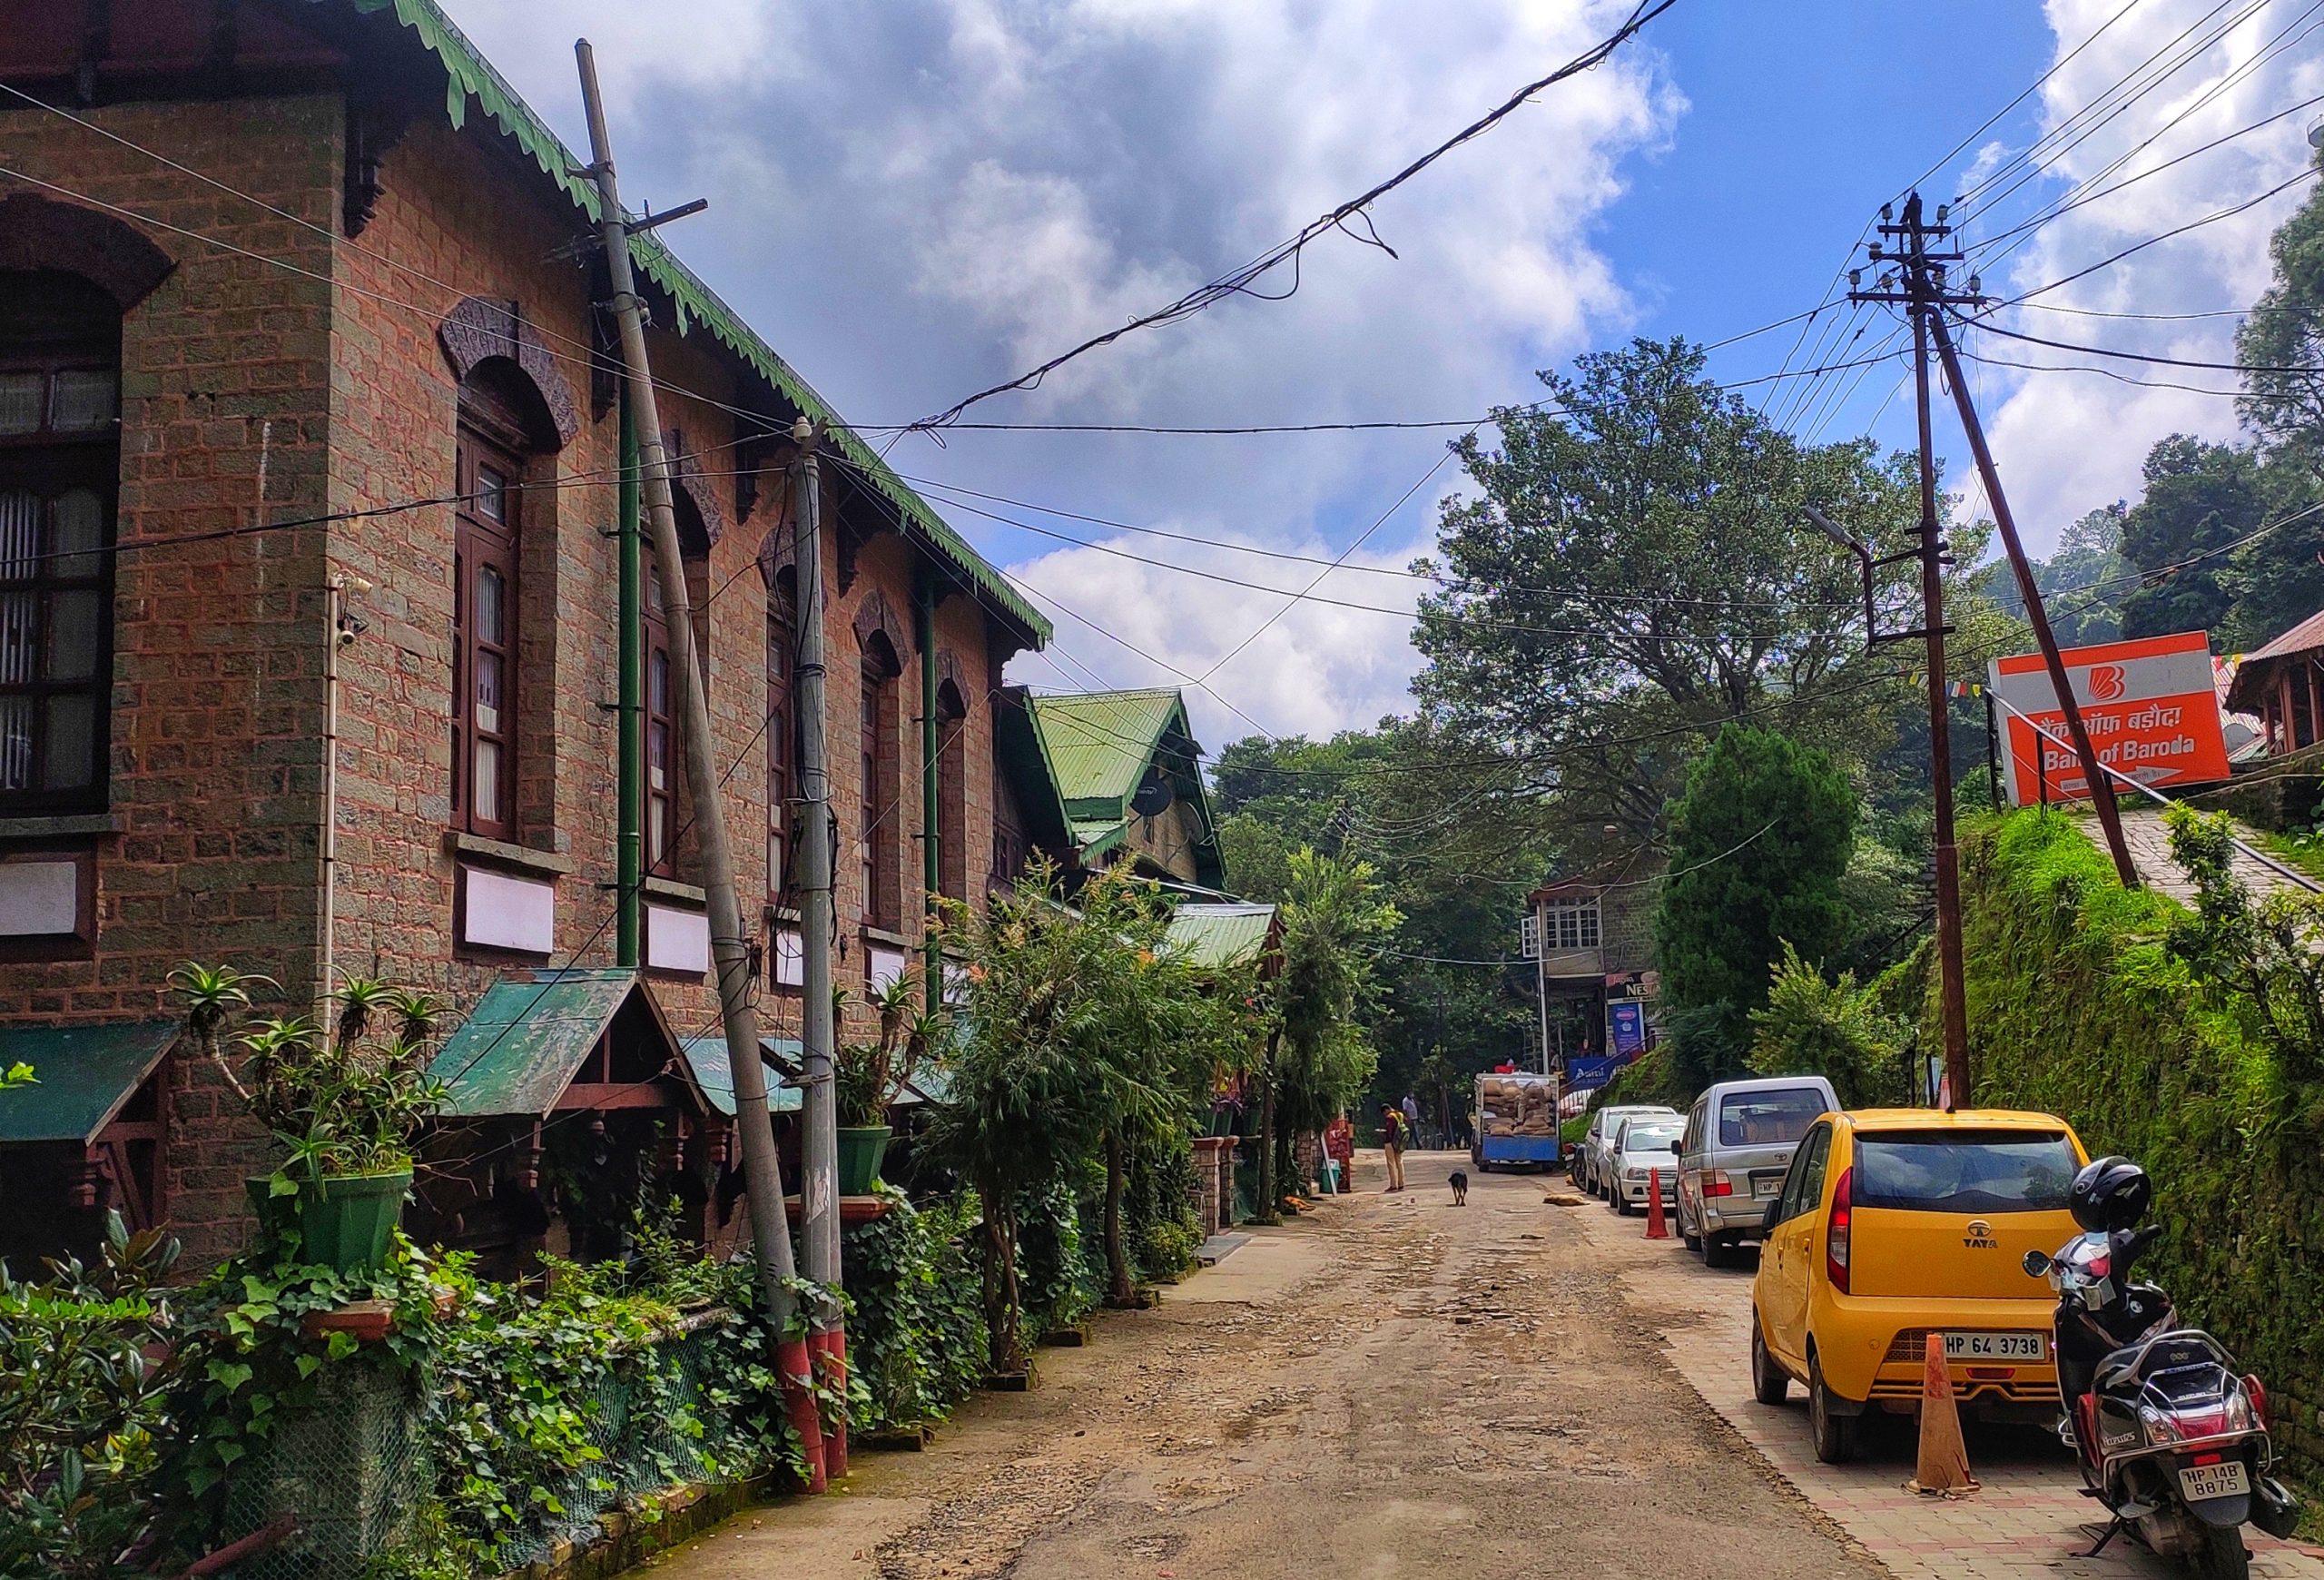 Street of a hill town